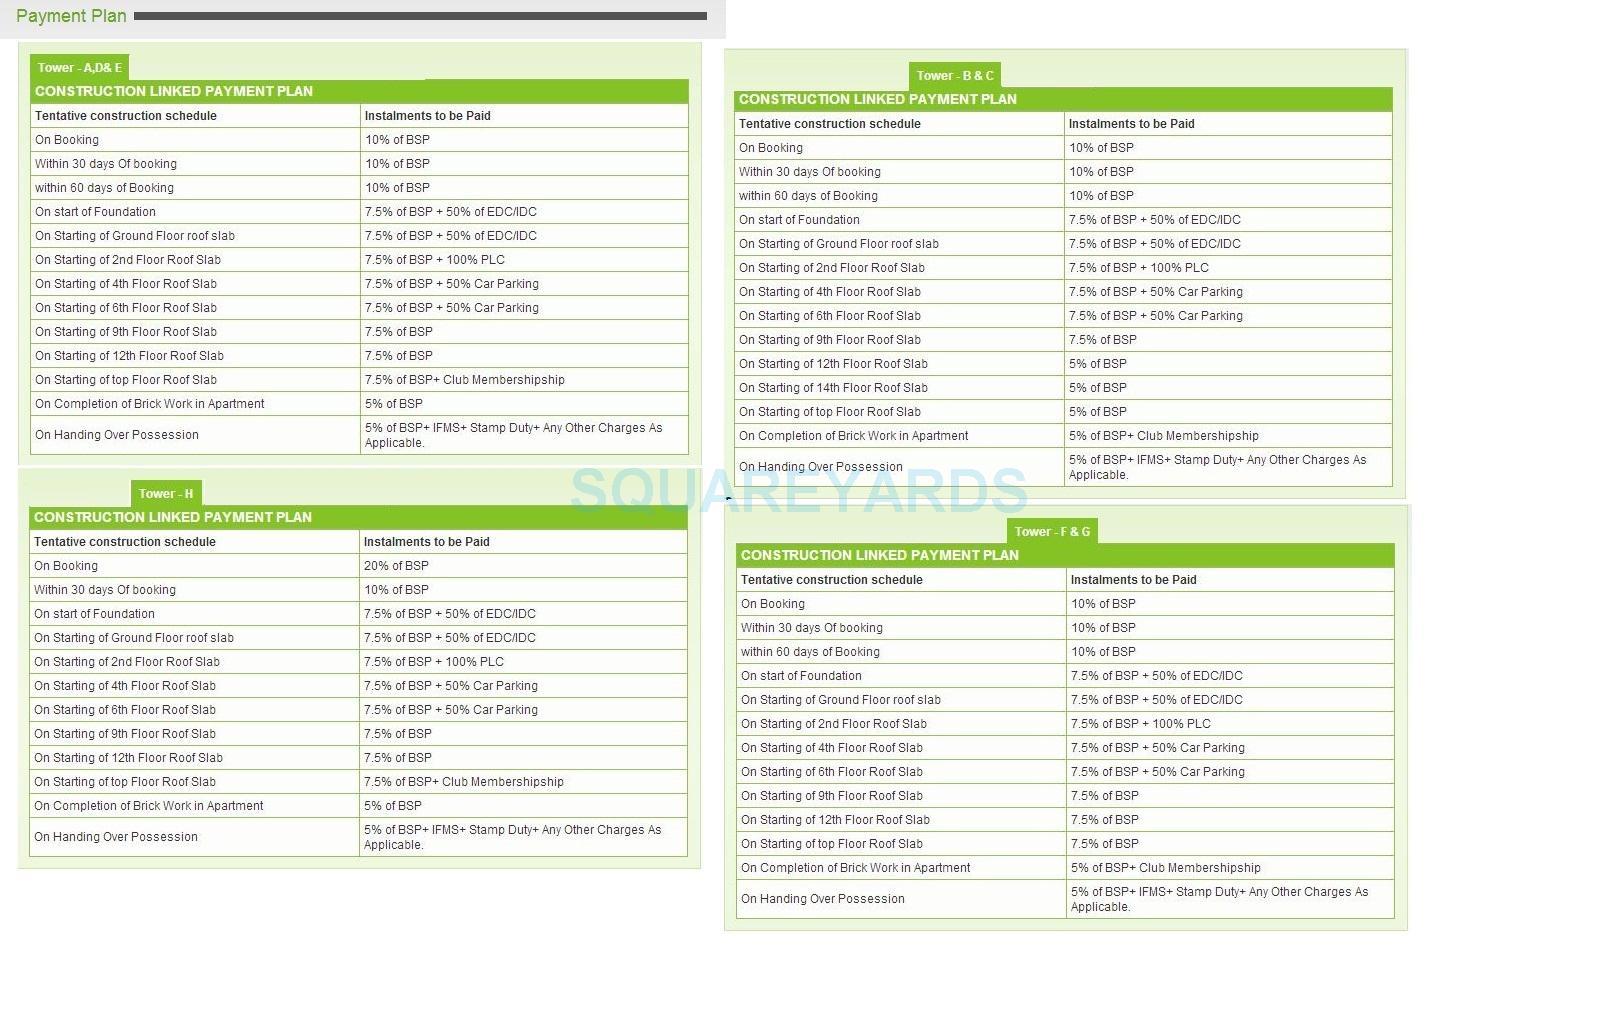 sidhartha estella payment plan image2